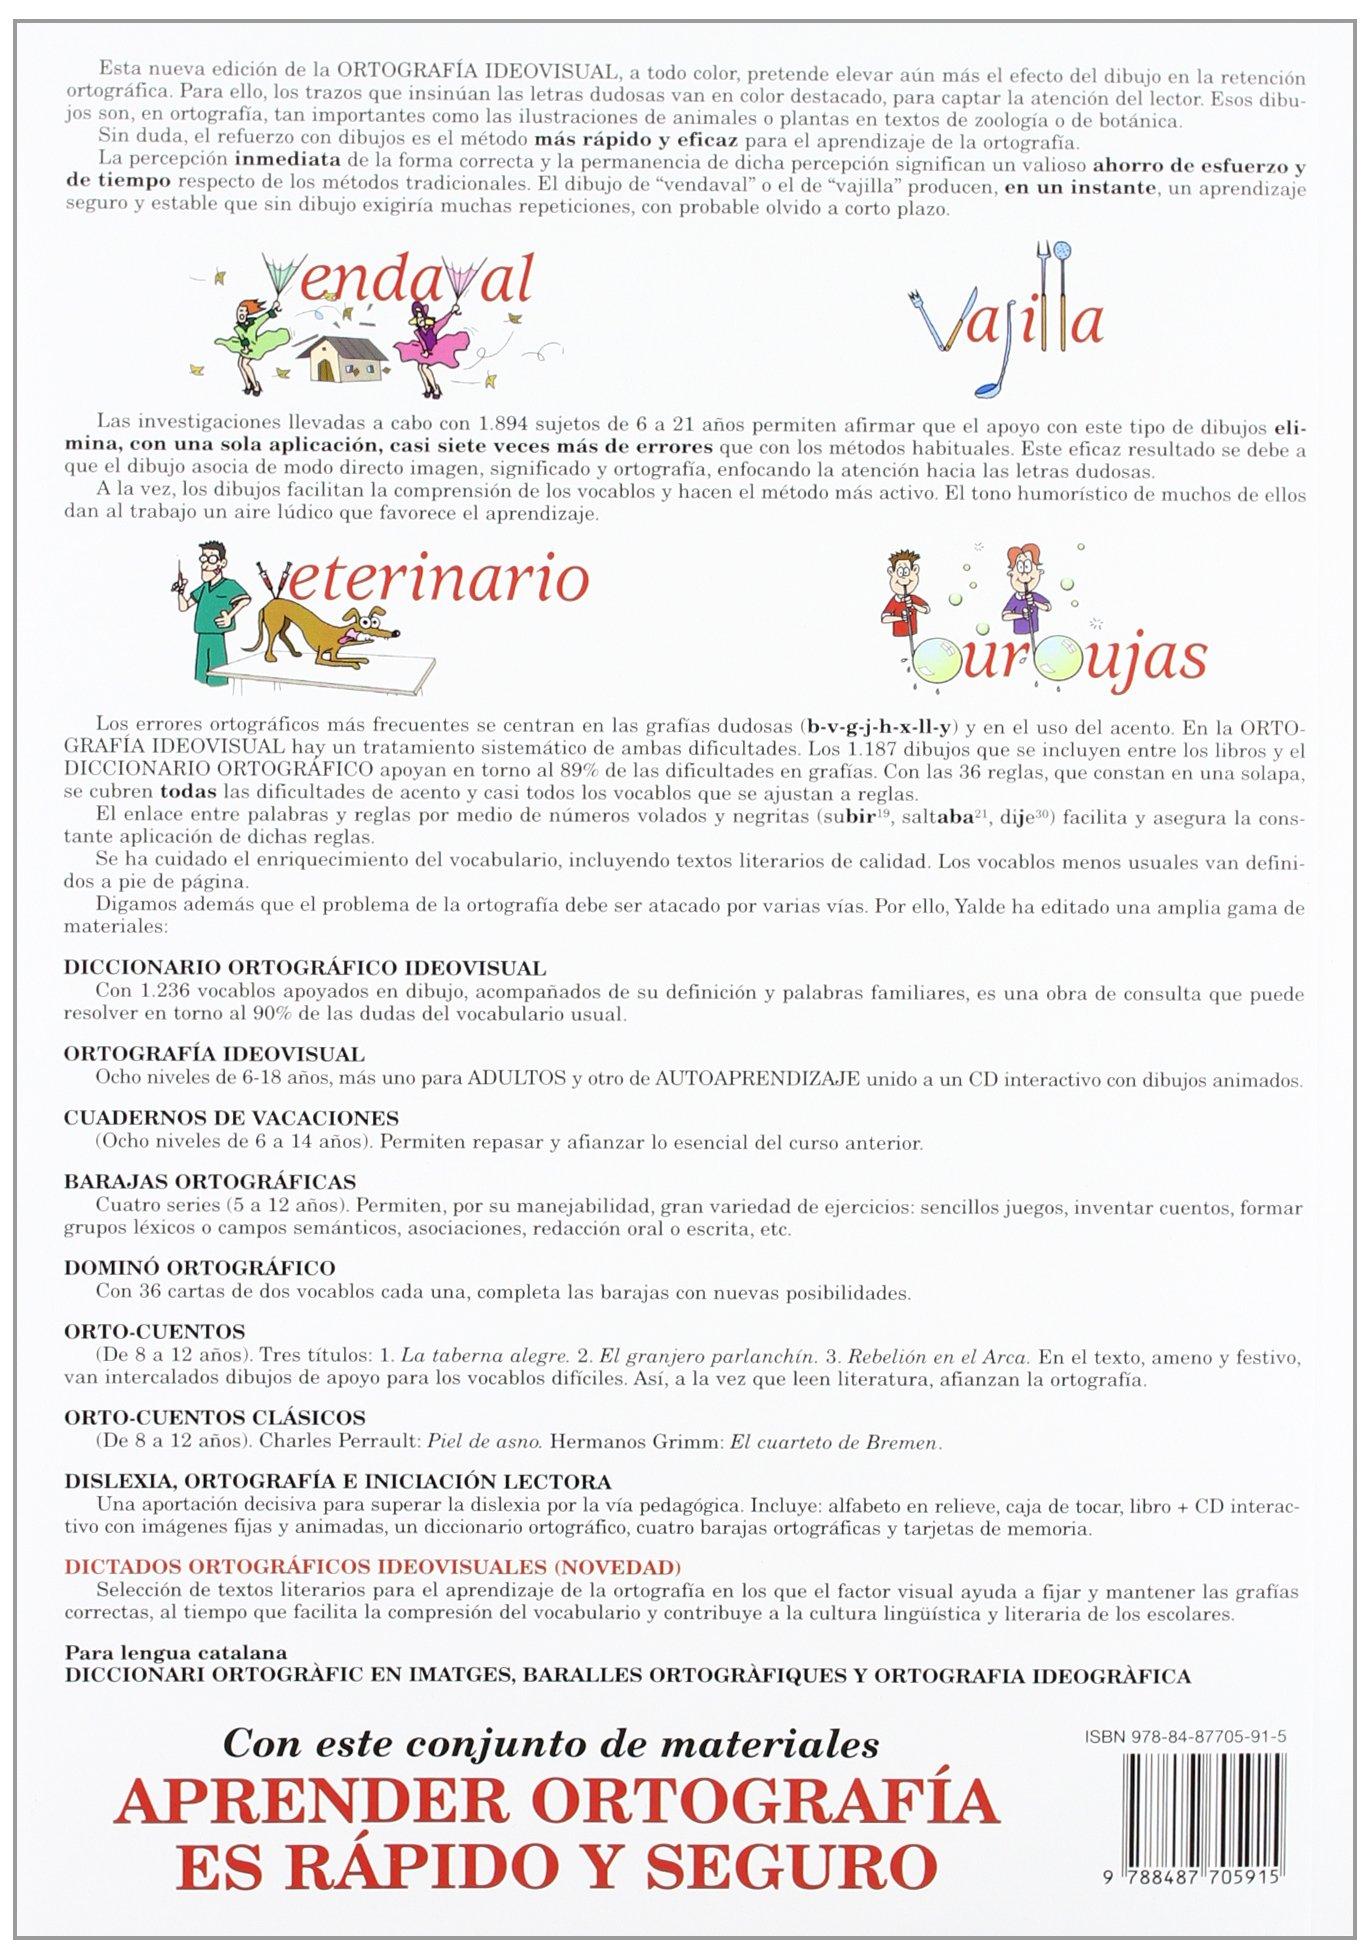 Adultos - 2º Edición: Amazon.es: Manuel Sanjuán Nájera, María Luisa Sanjuán Álvarez: Libros